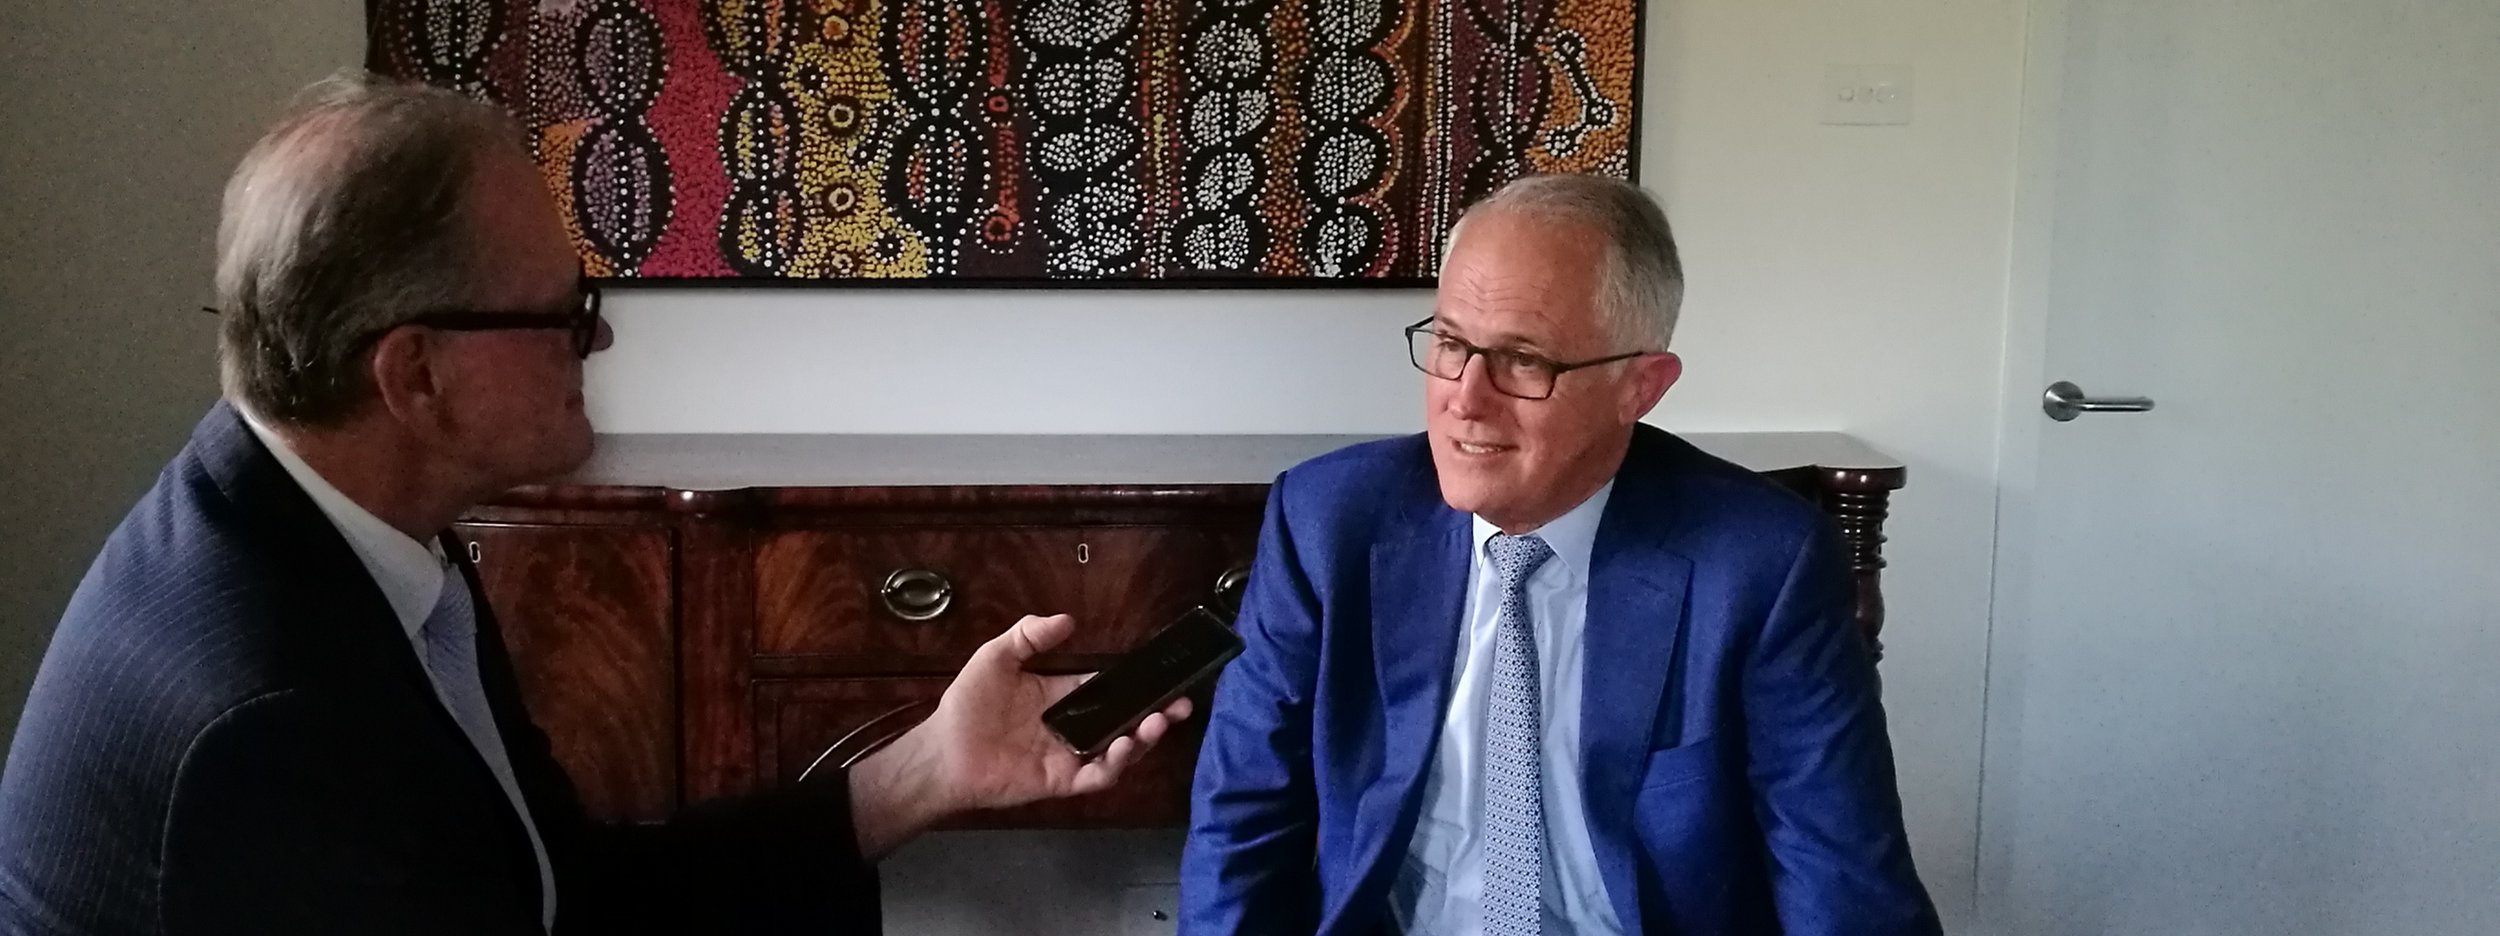 Tim with PM Turnbull at Lodge.jpg